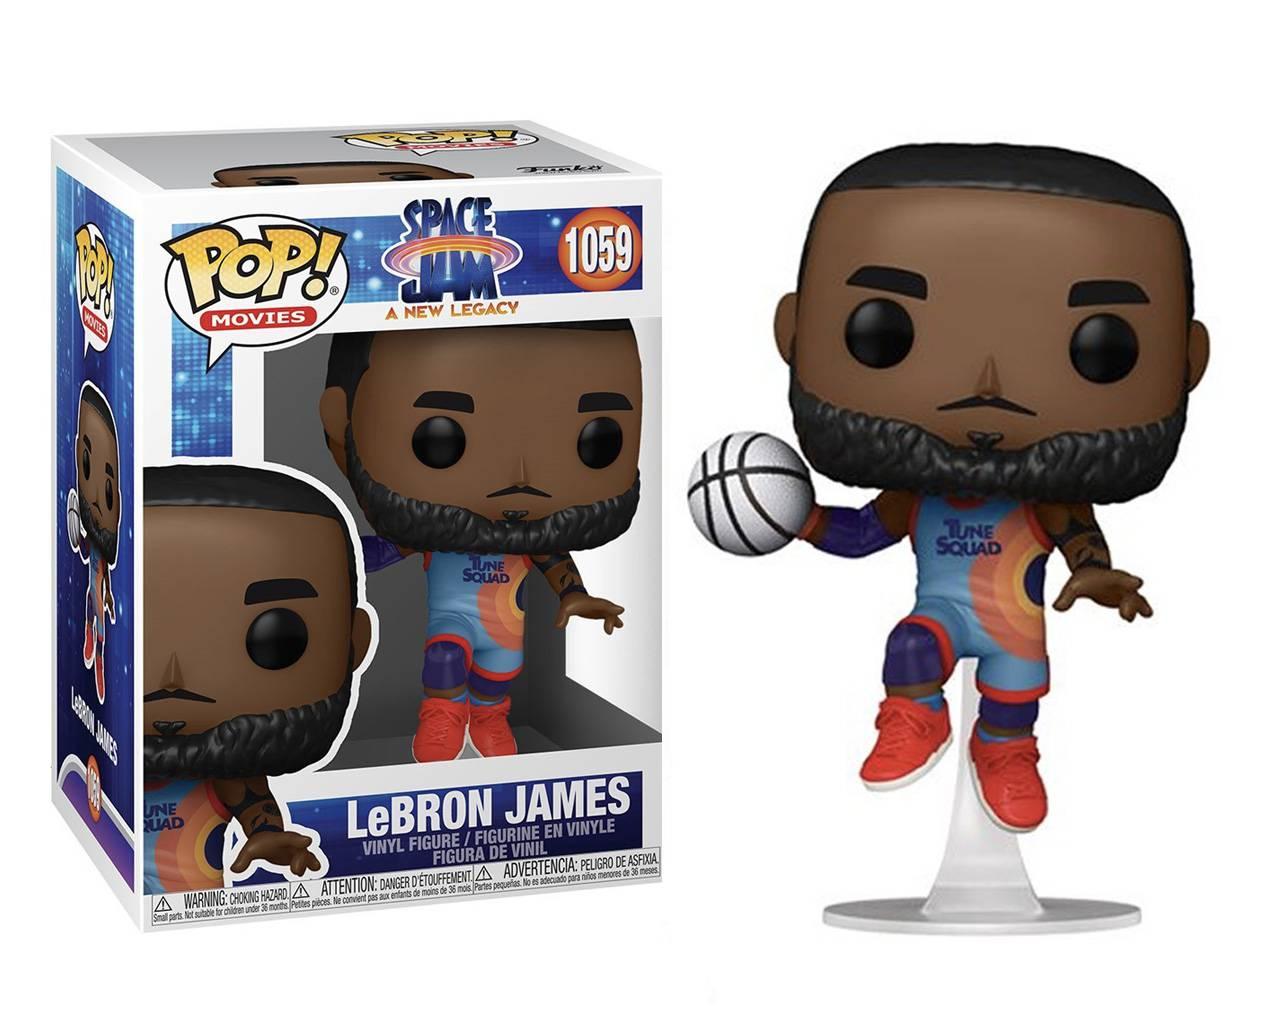 LeBron James (Space Jam 2) Pop! Vinyl